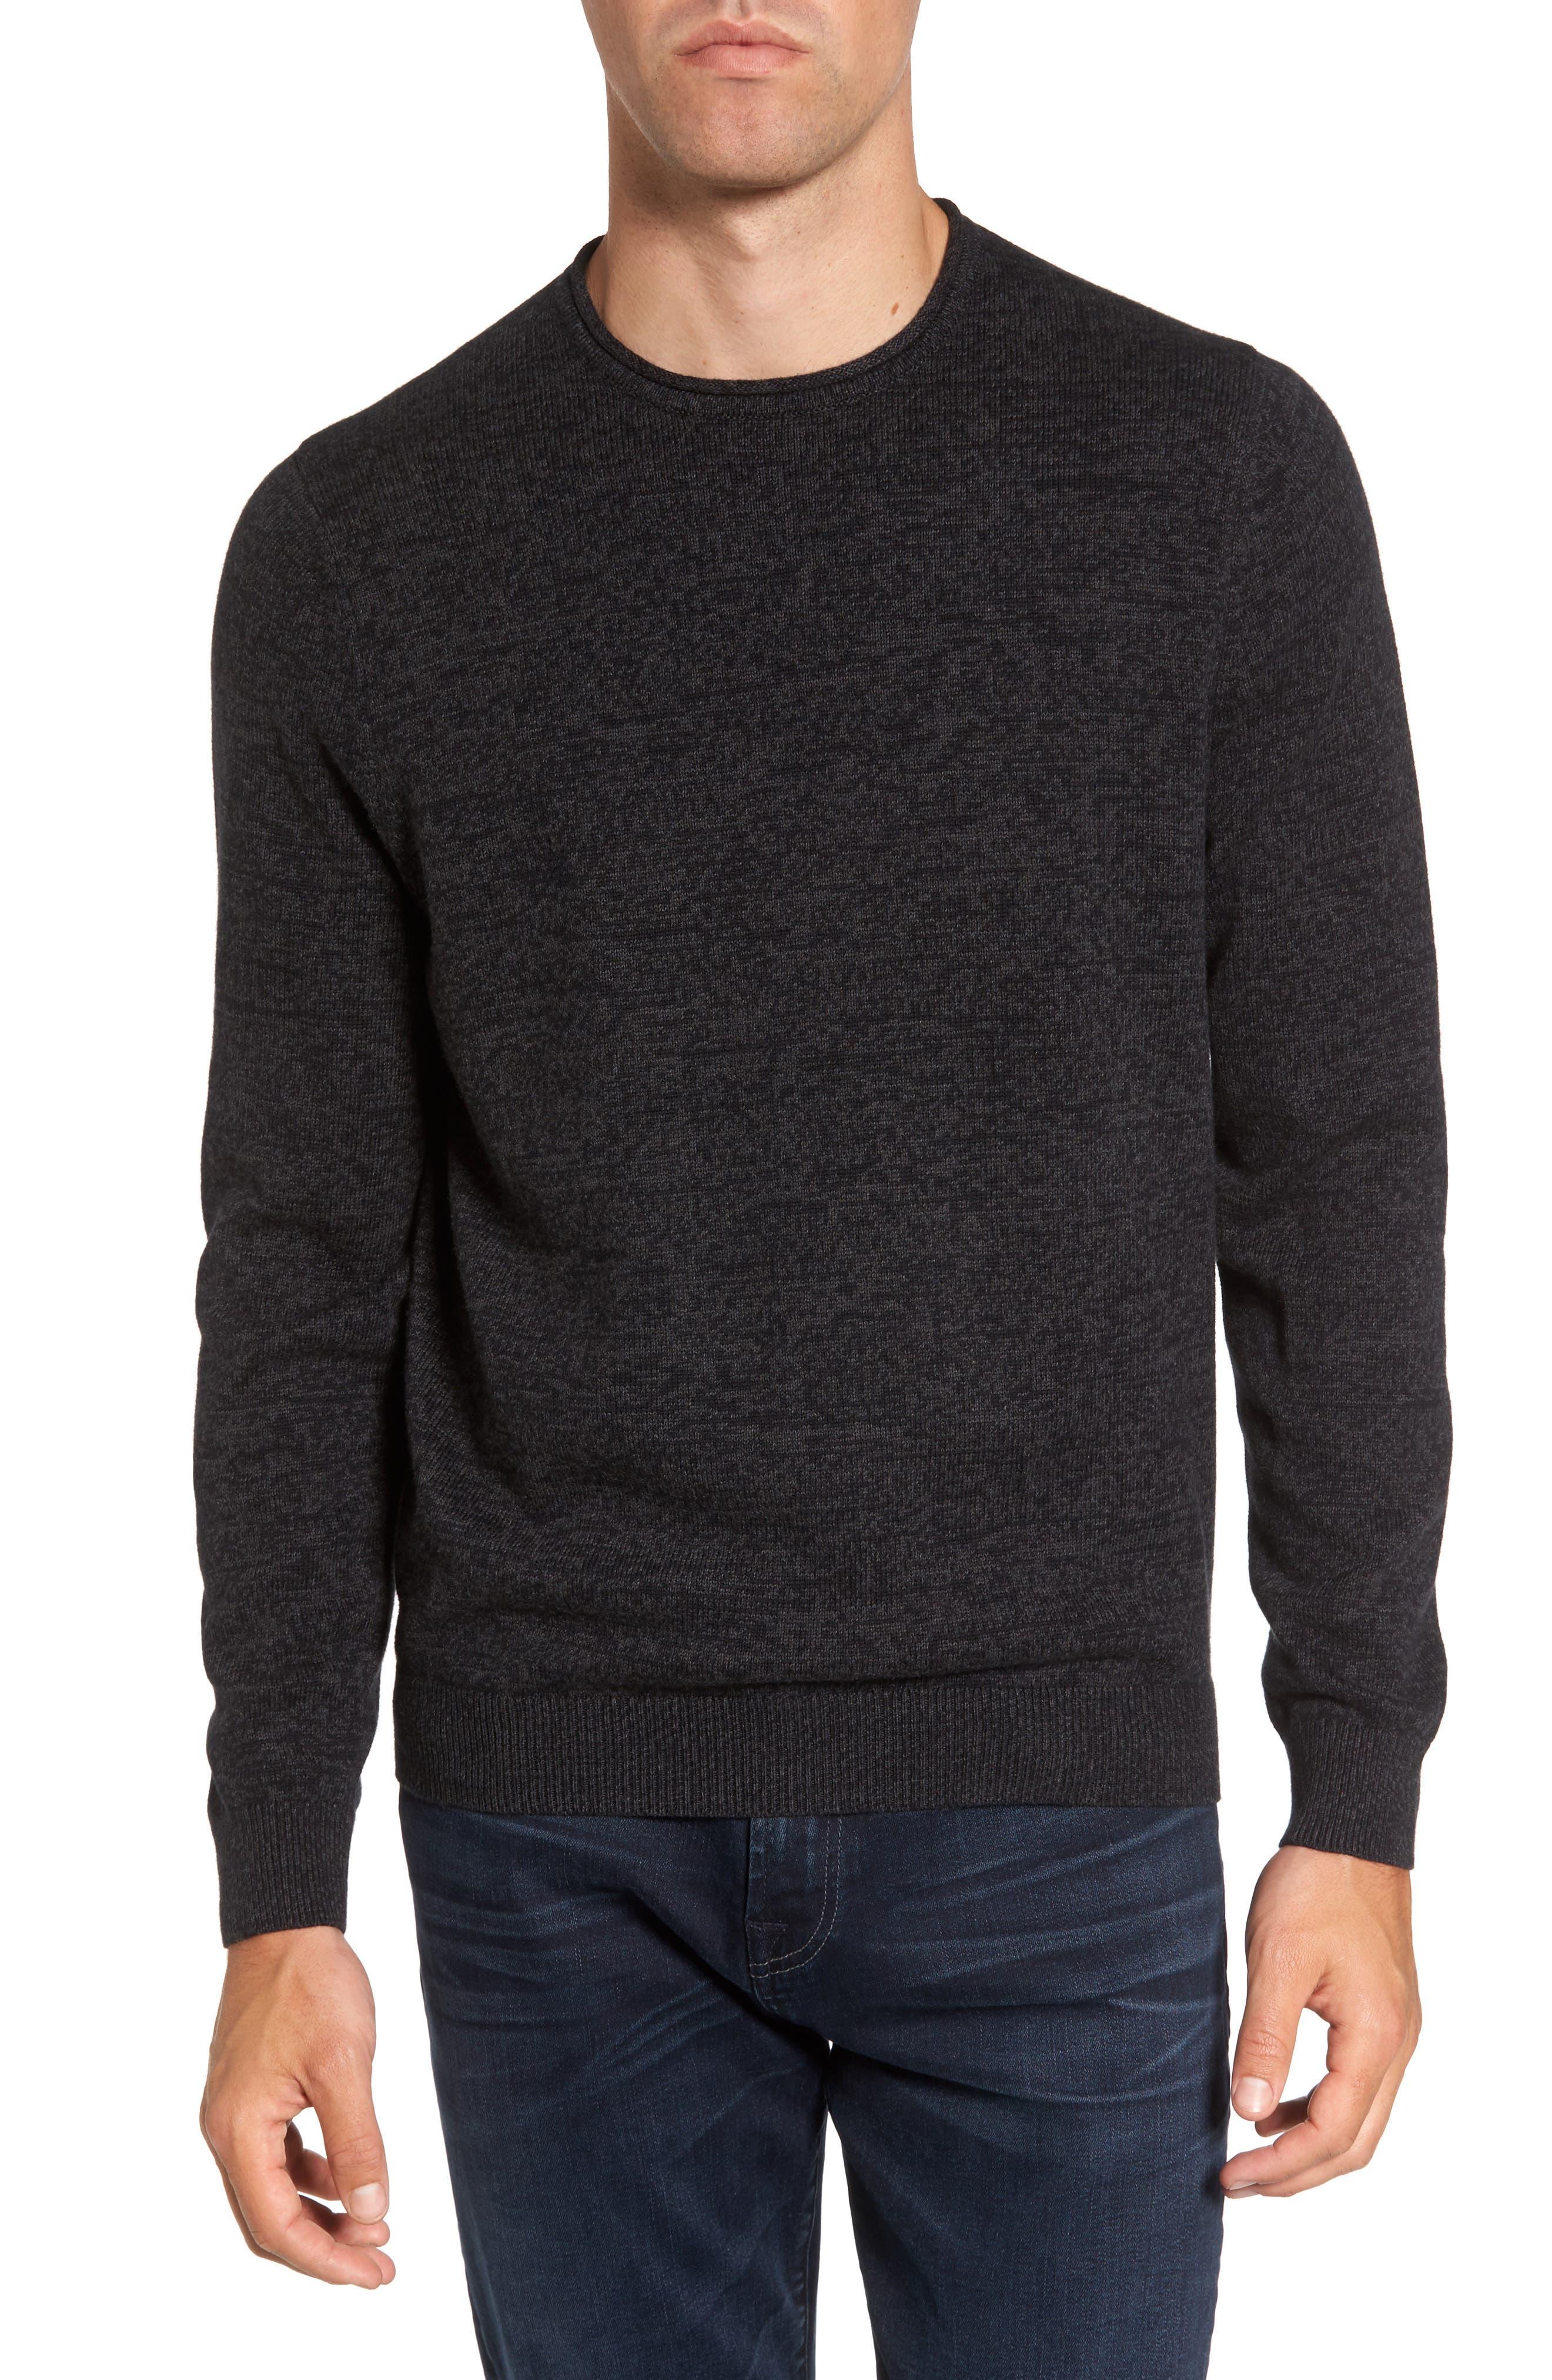 Nordstrom Men's Shop Cotton & Cashmere Roll Neck Sweater